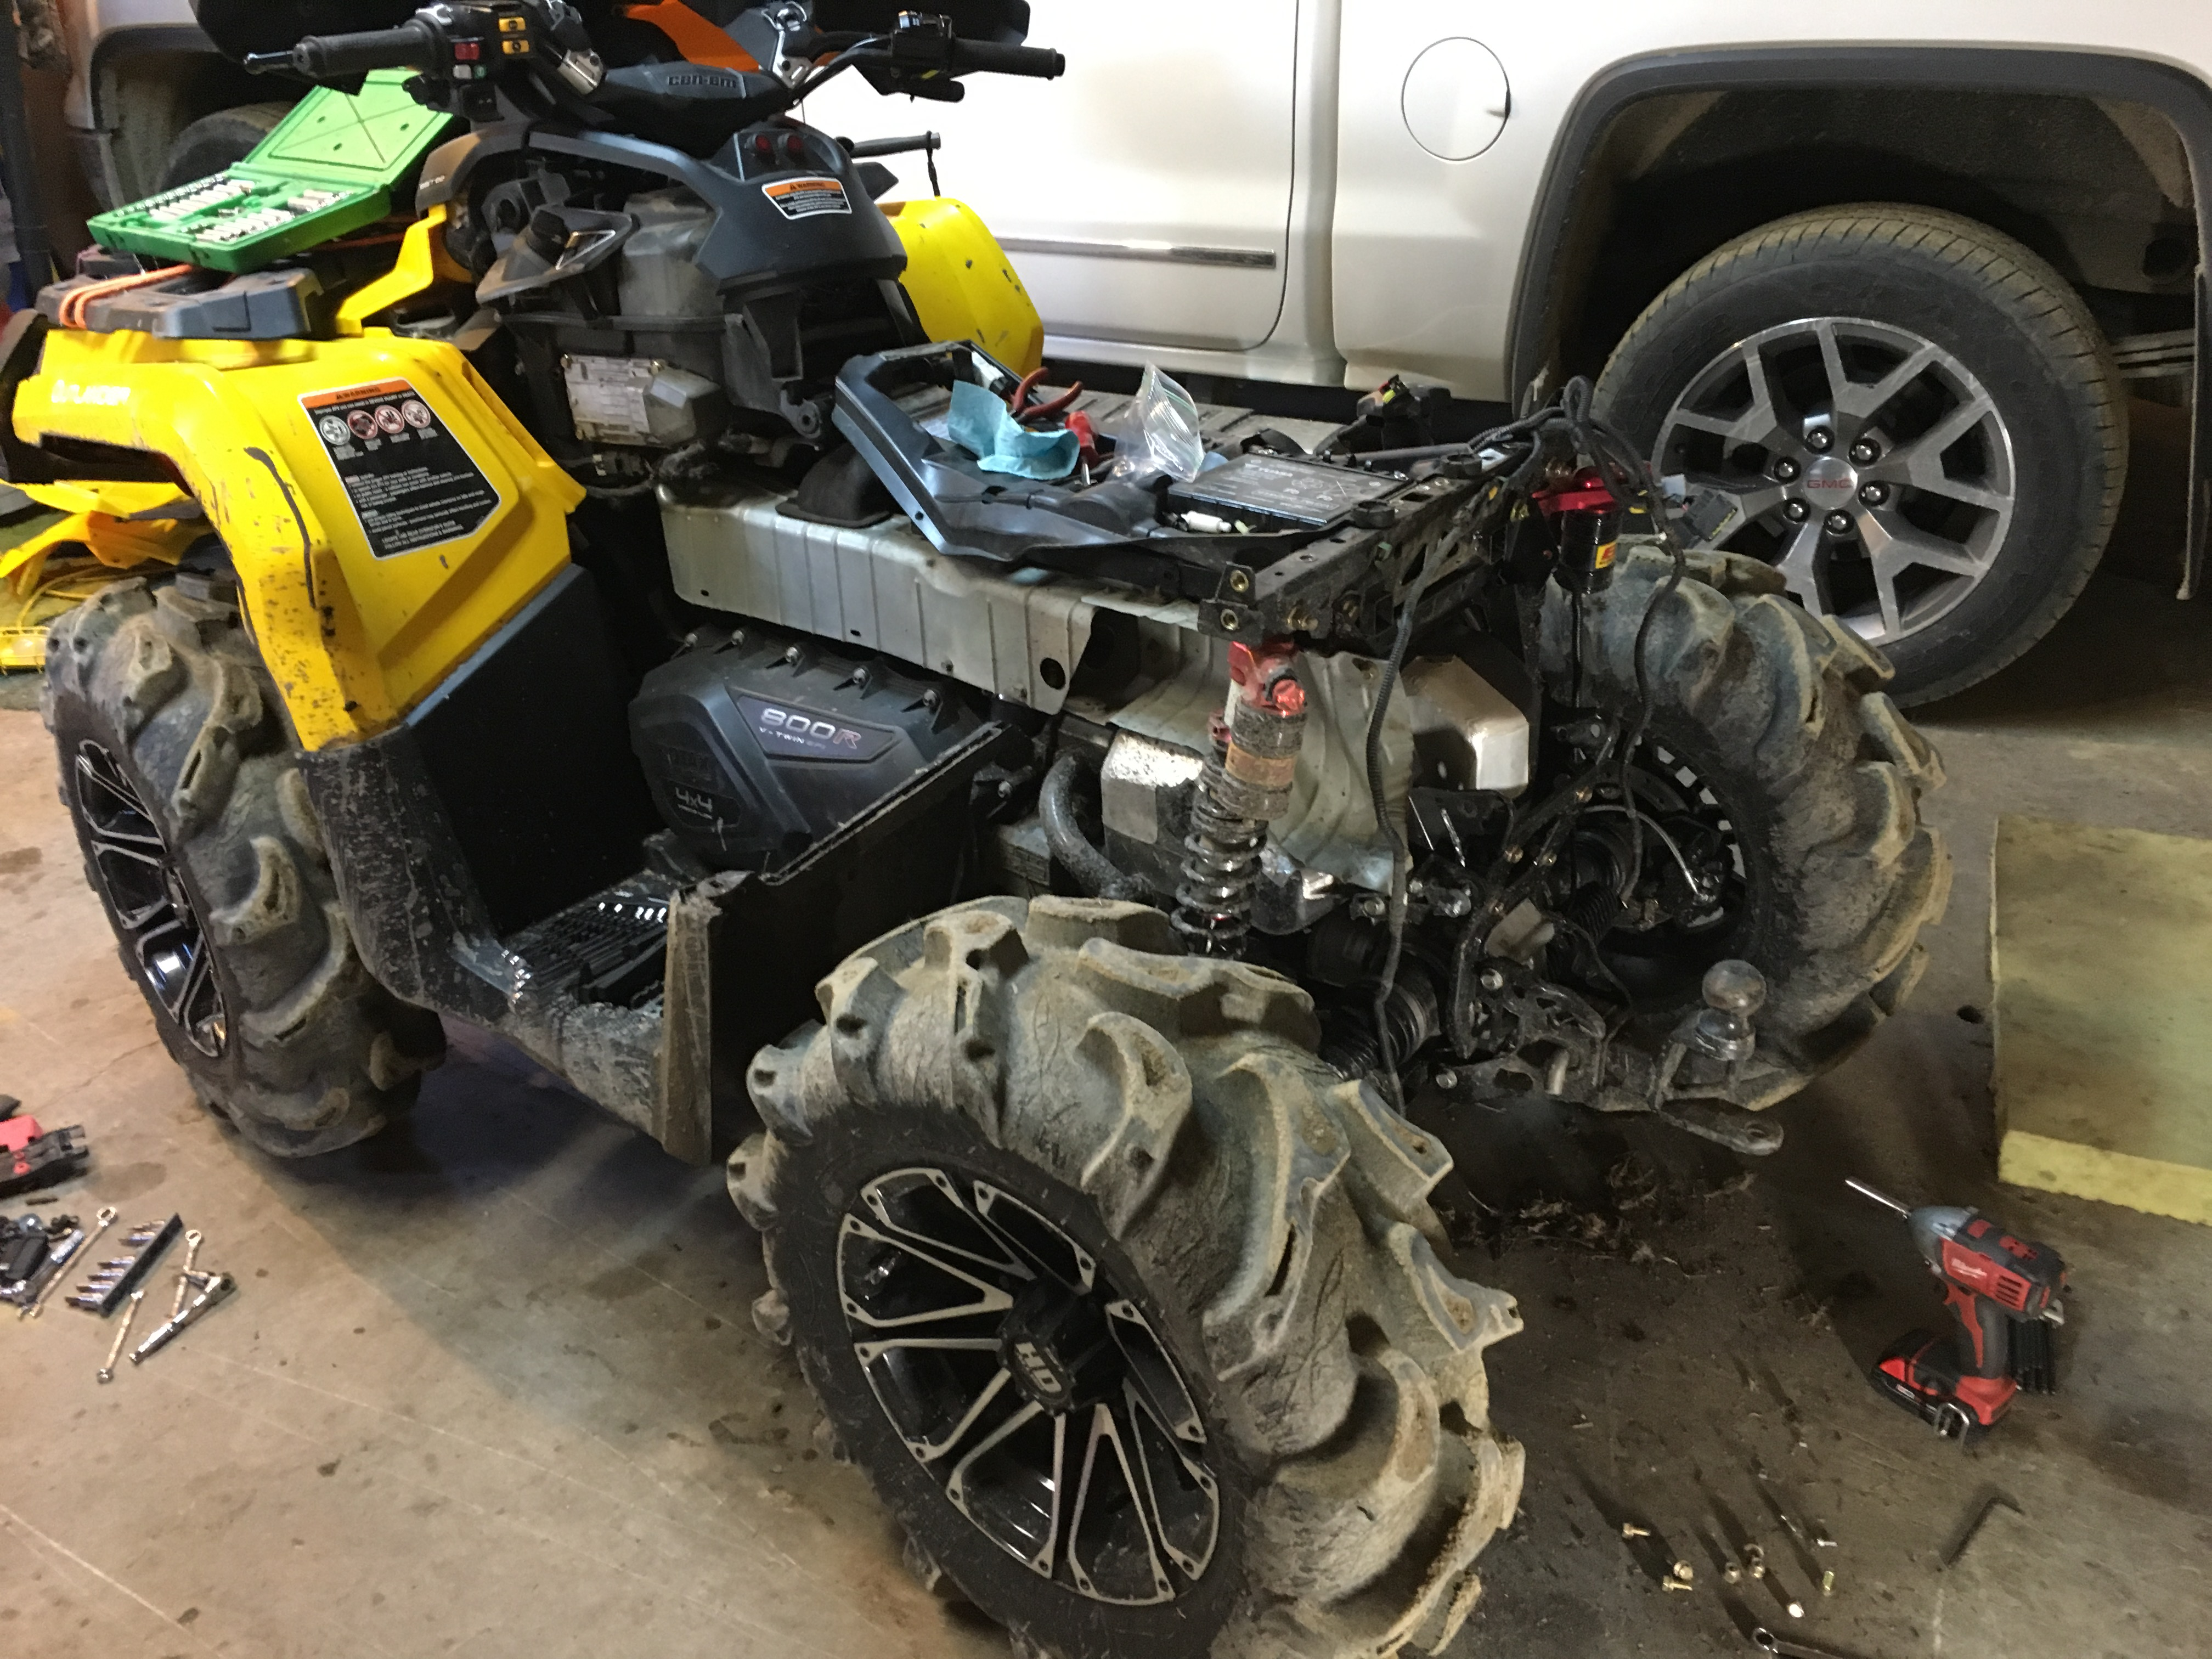 Special Type Spark Plug 2014 Can-Am Renegade 1000 ATV